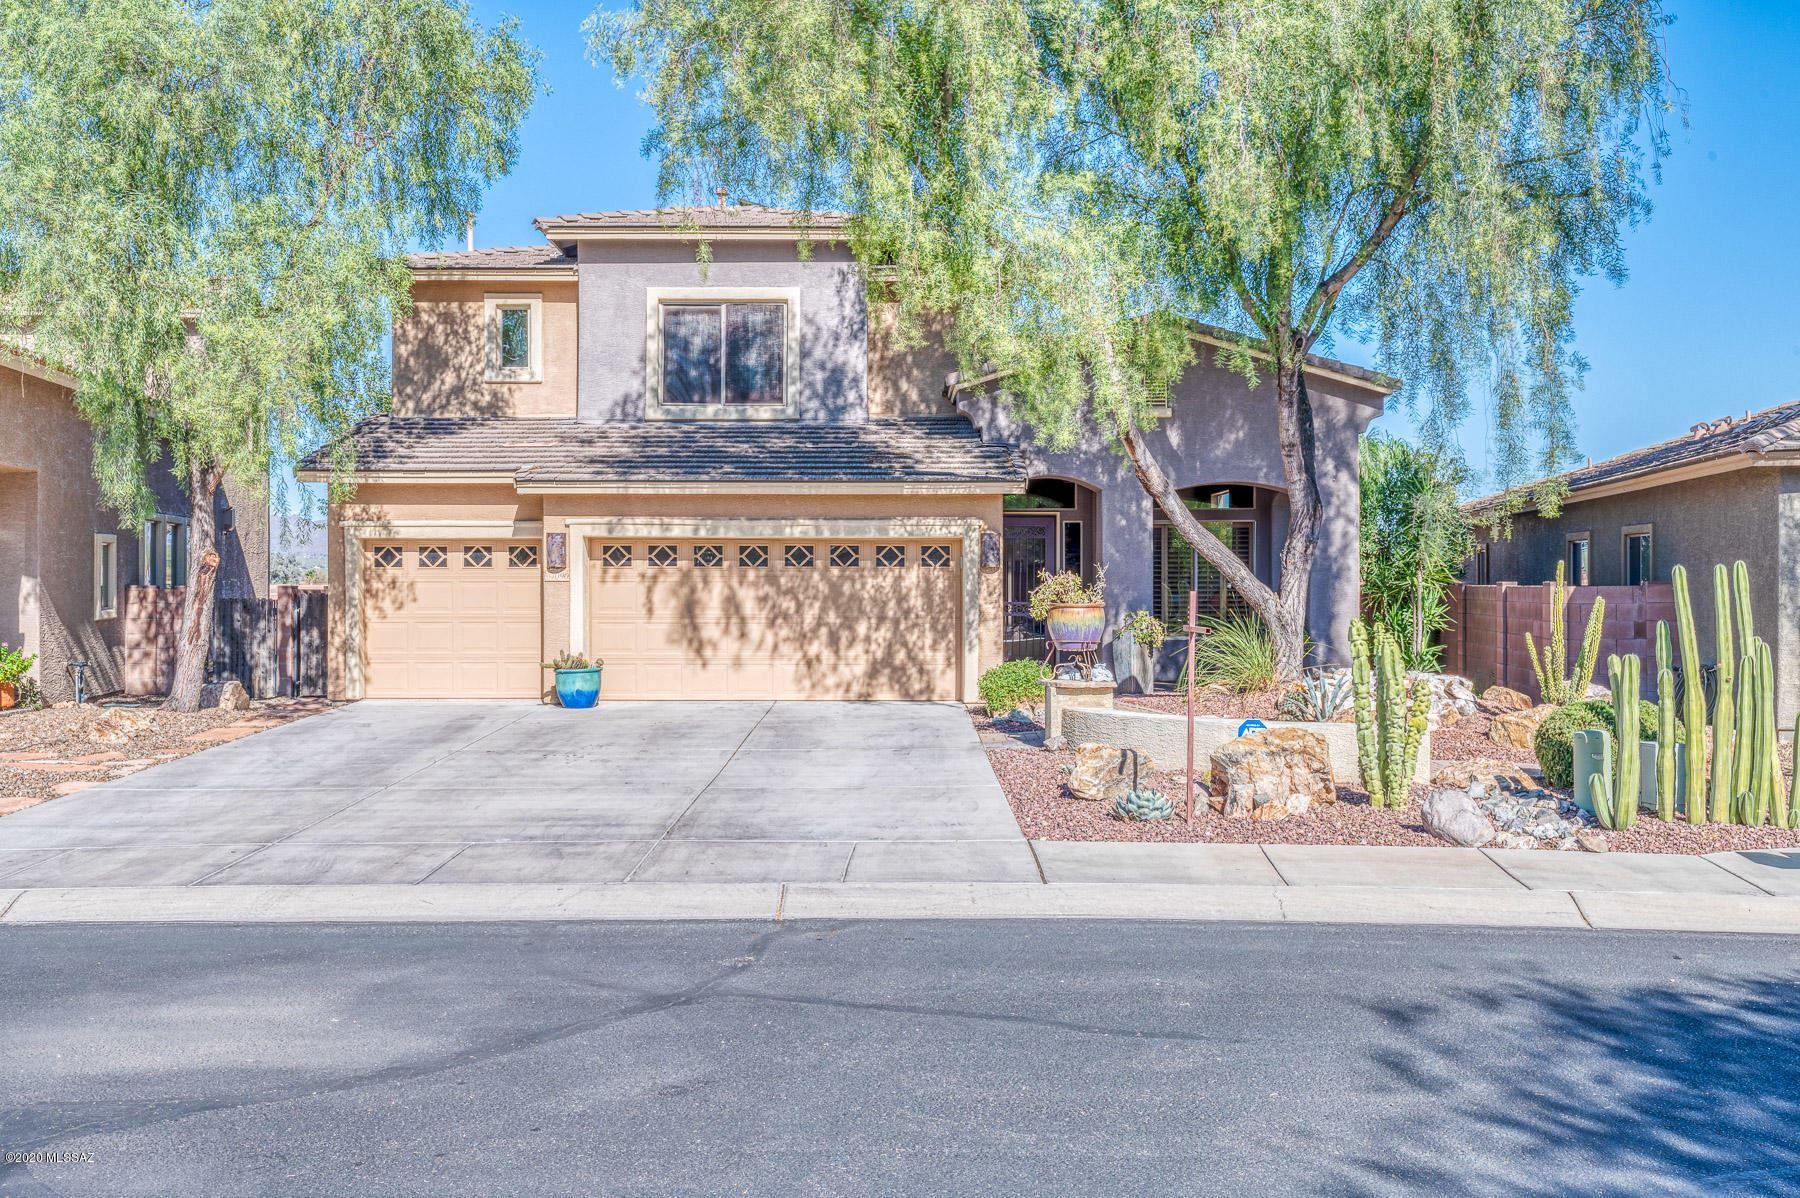 7090 W Glowing Star Drive, Tucson, AZ 85743 - #: 22028576